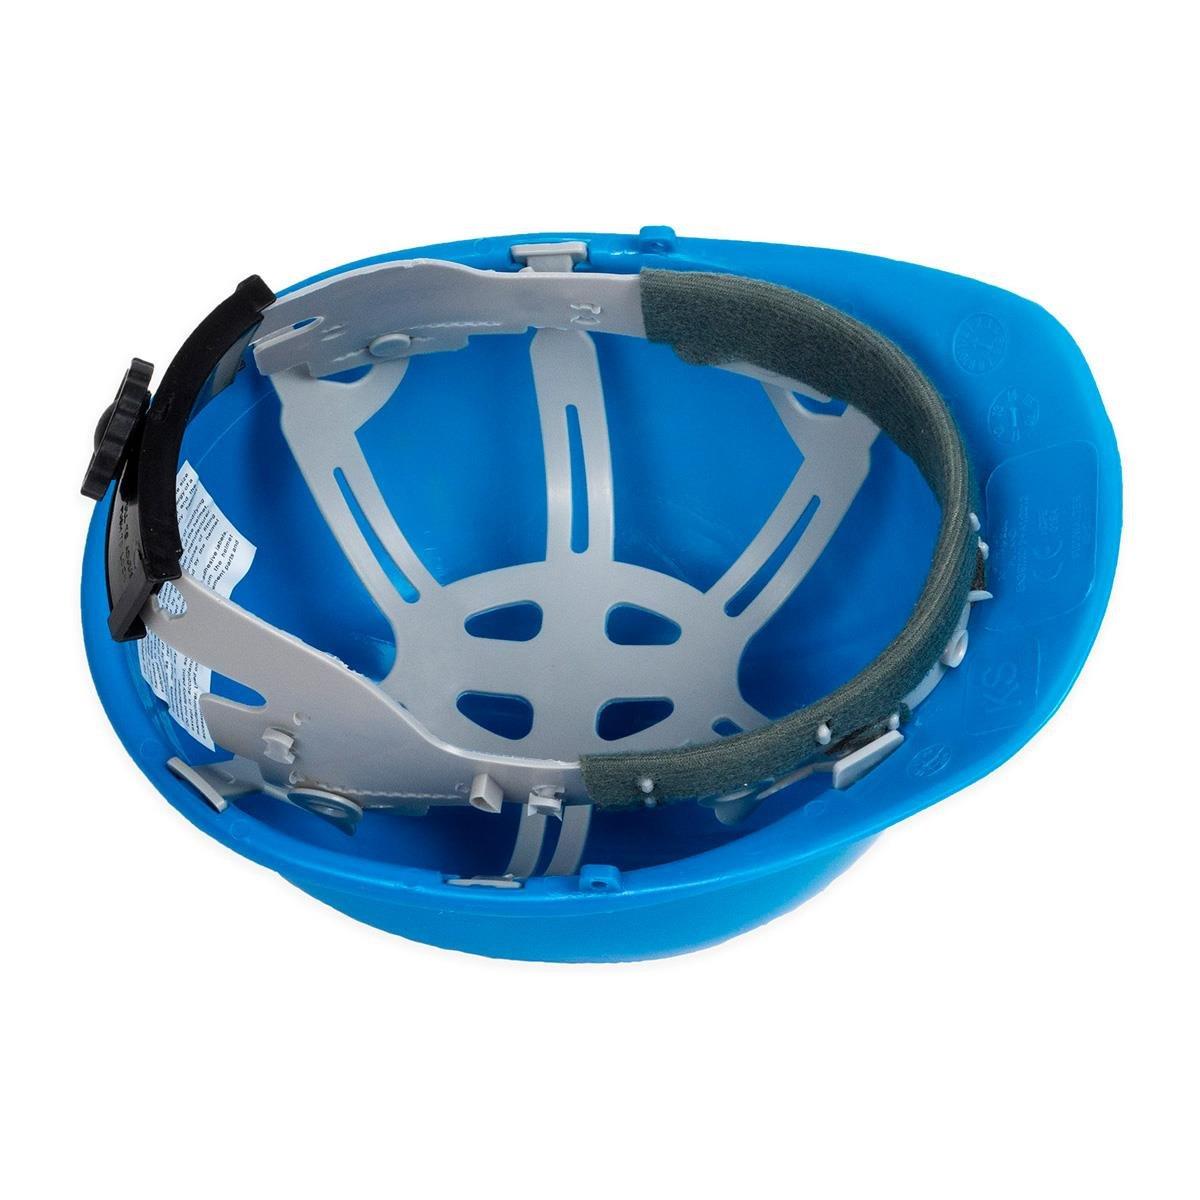 5 Bauhelm blau Schutzhelm Helm Arbeitsschutzhelm